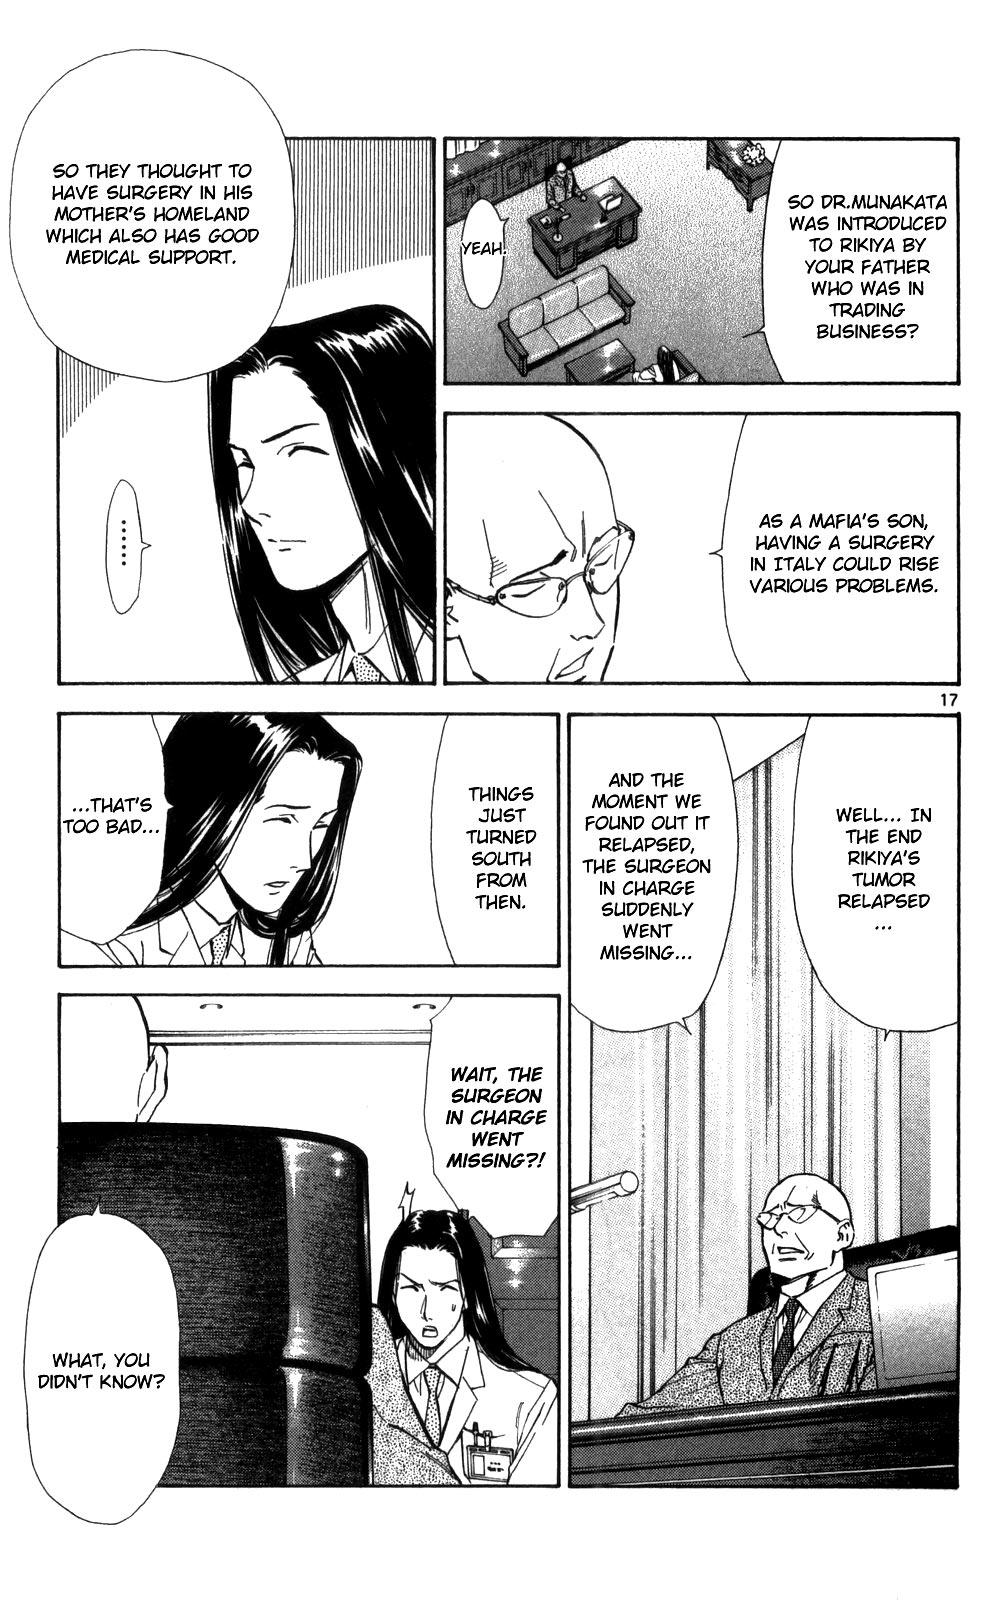 Saijou no Meii - Chapter 52